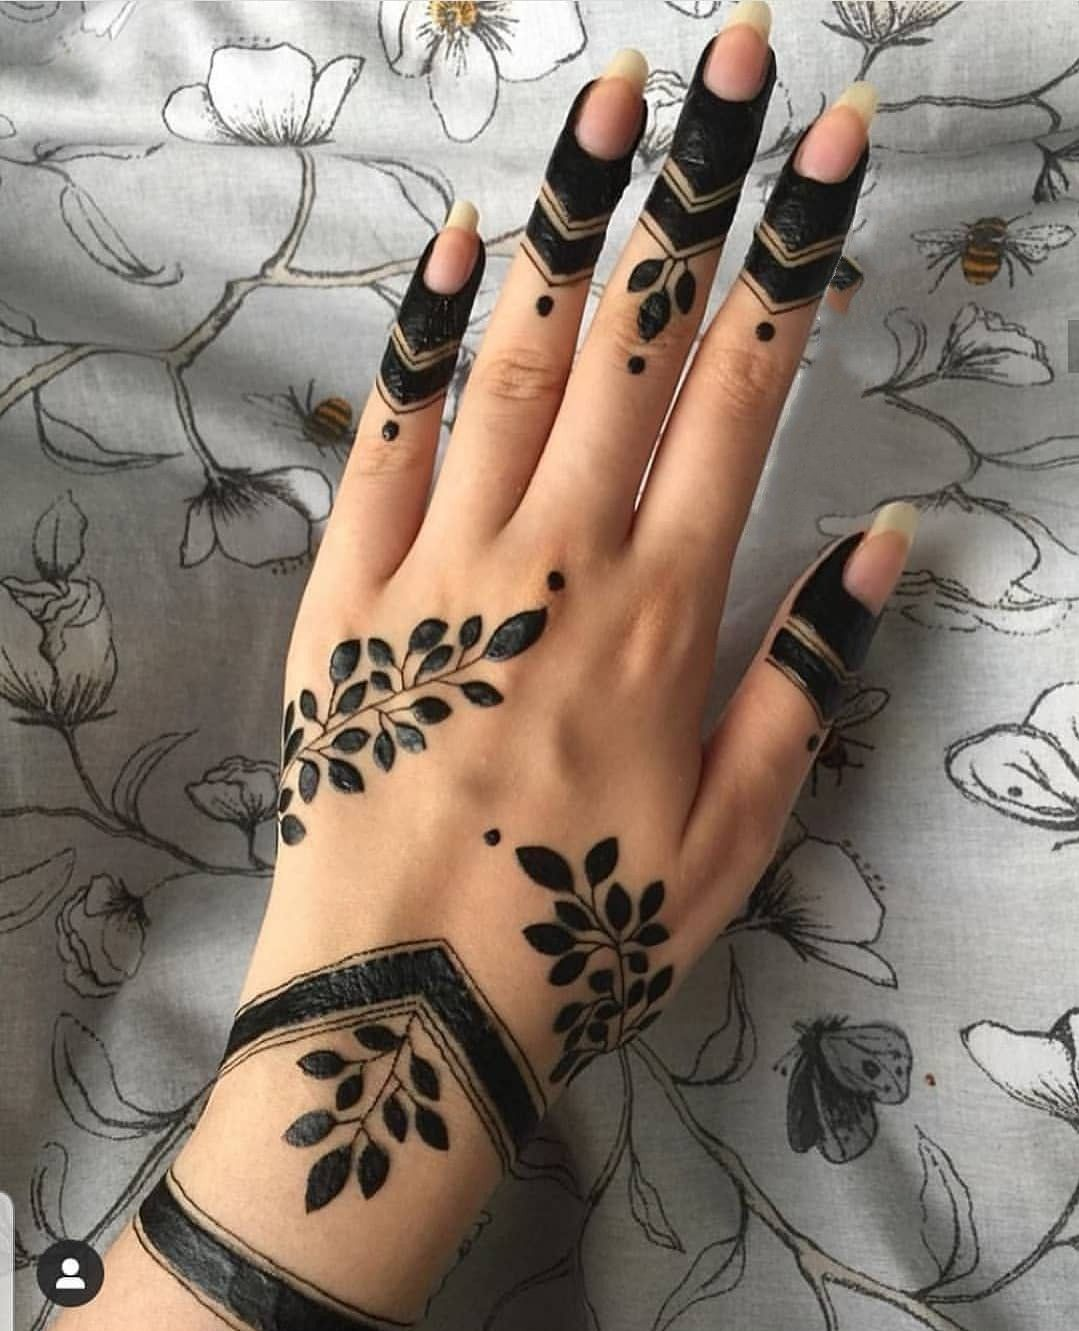 42 Trendy Henna Tattoo Design Ideas To Try In 2020 Henna Tattoo Designs Henna Tattoo Designs Simple Henna Designs Hand